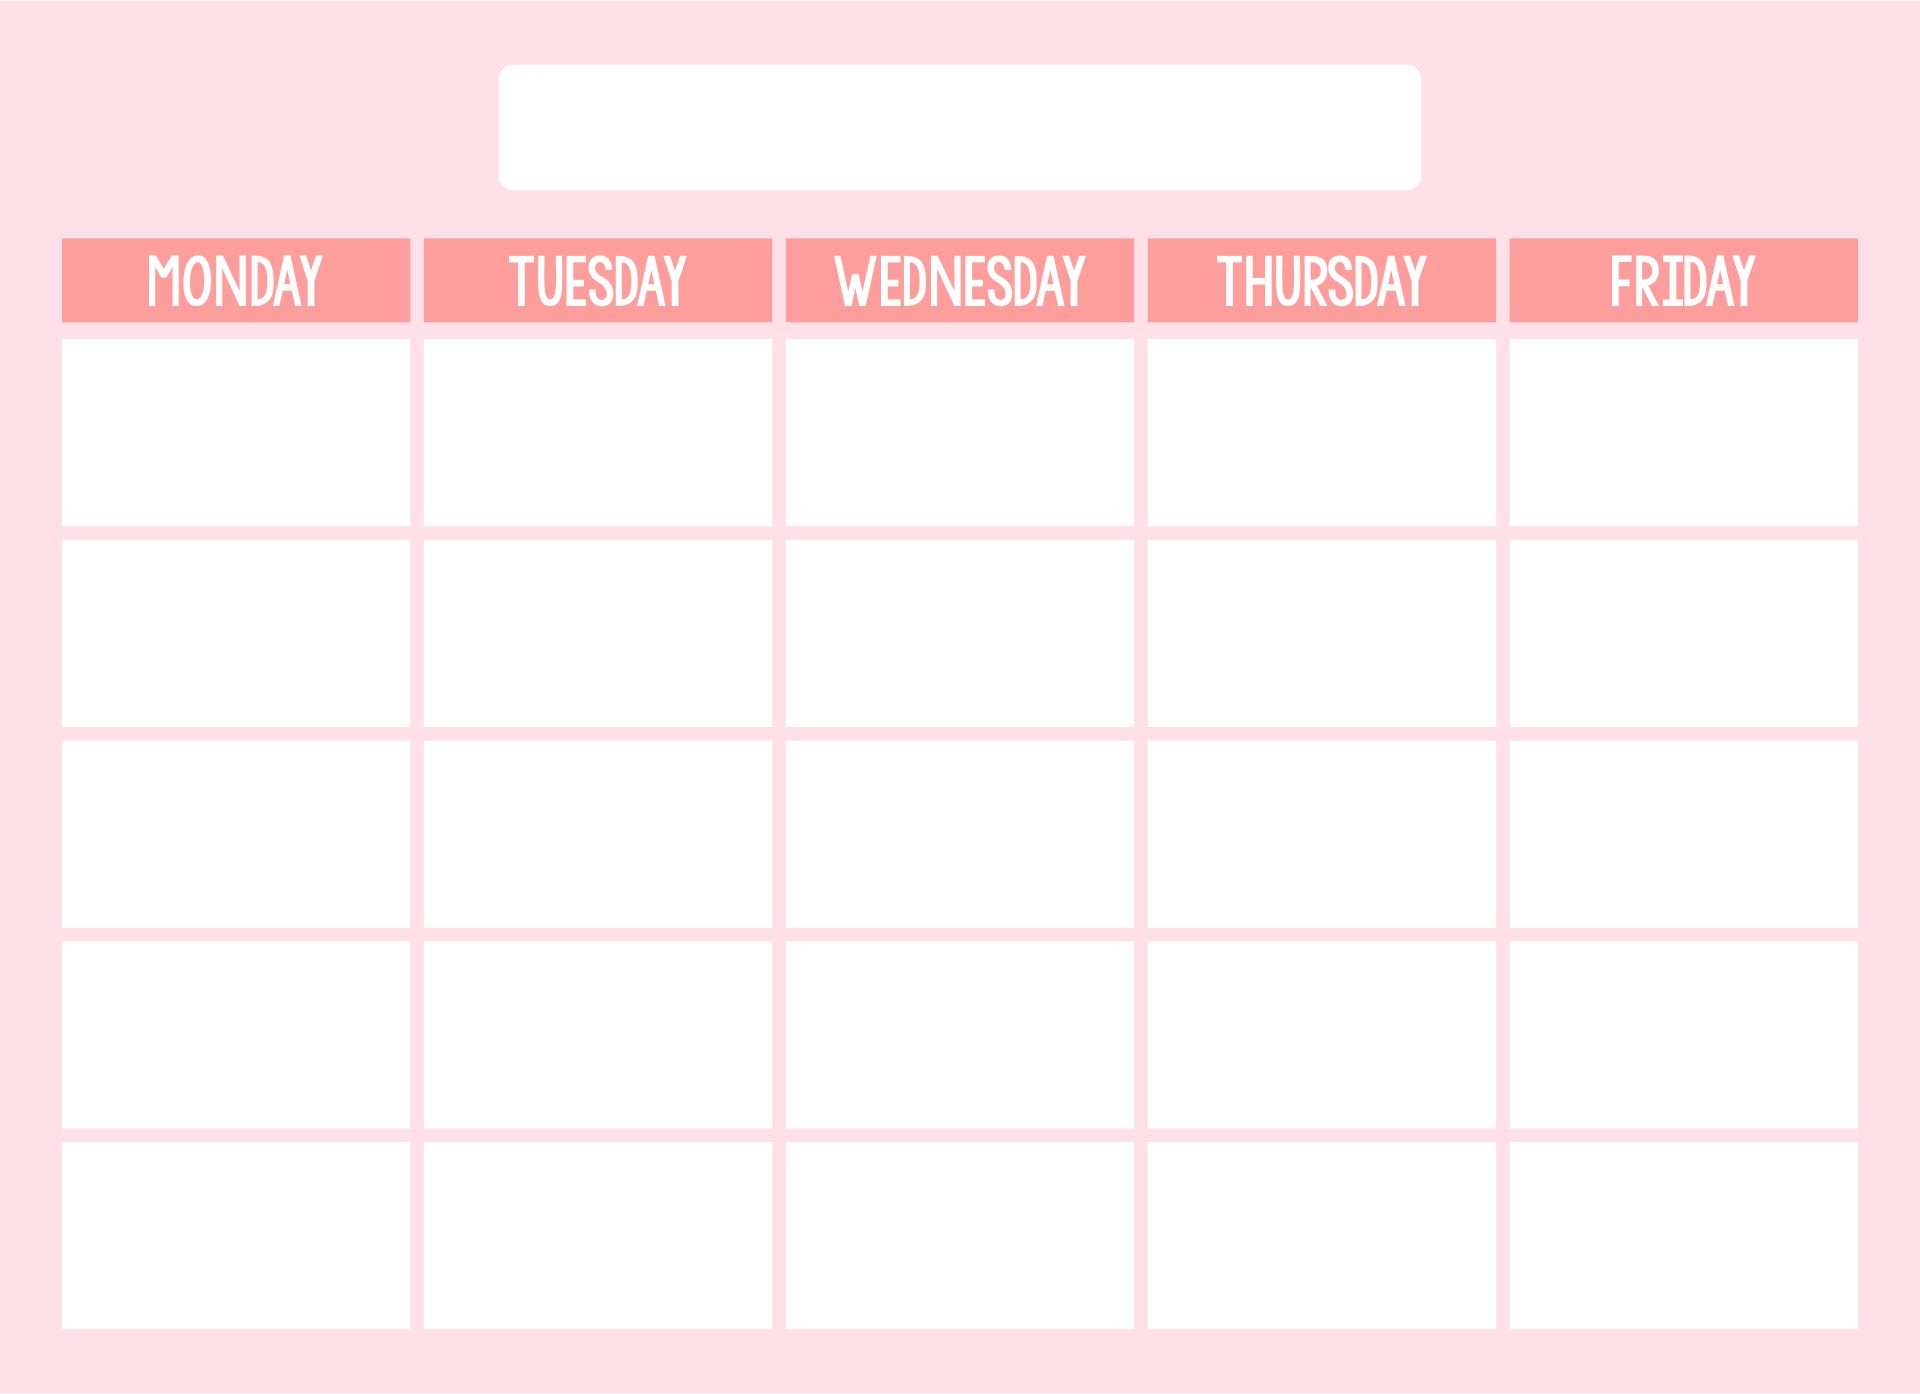 Blank Weekly Calendar Template Monday Friday